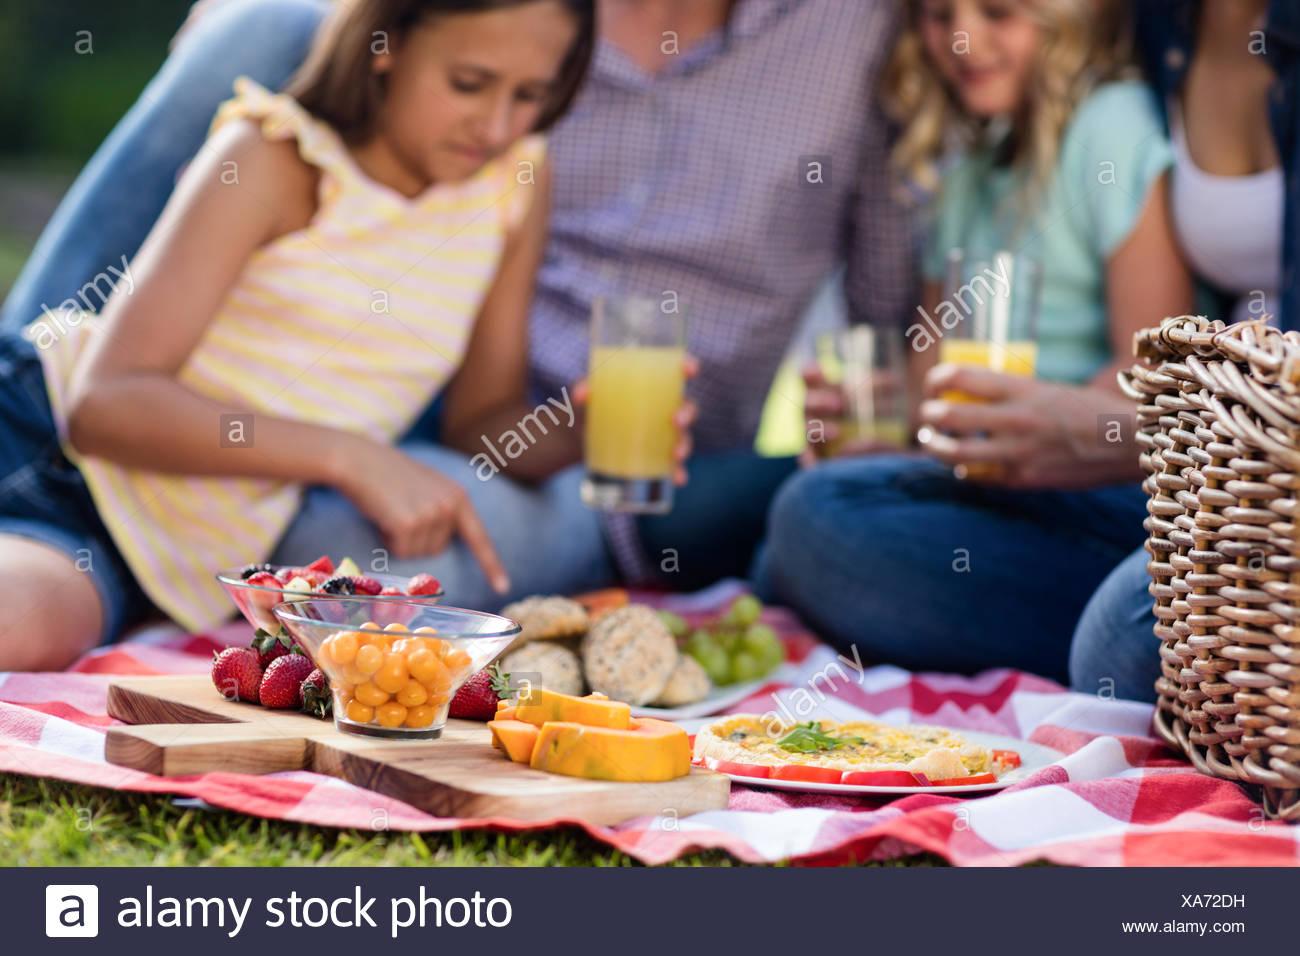 Family having a picnic - Stock Image